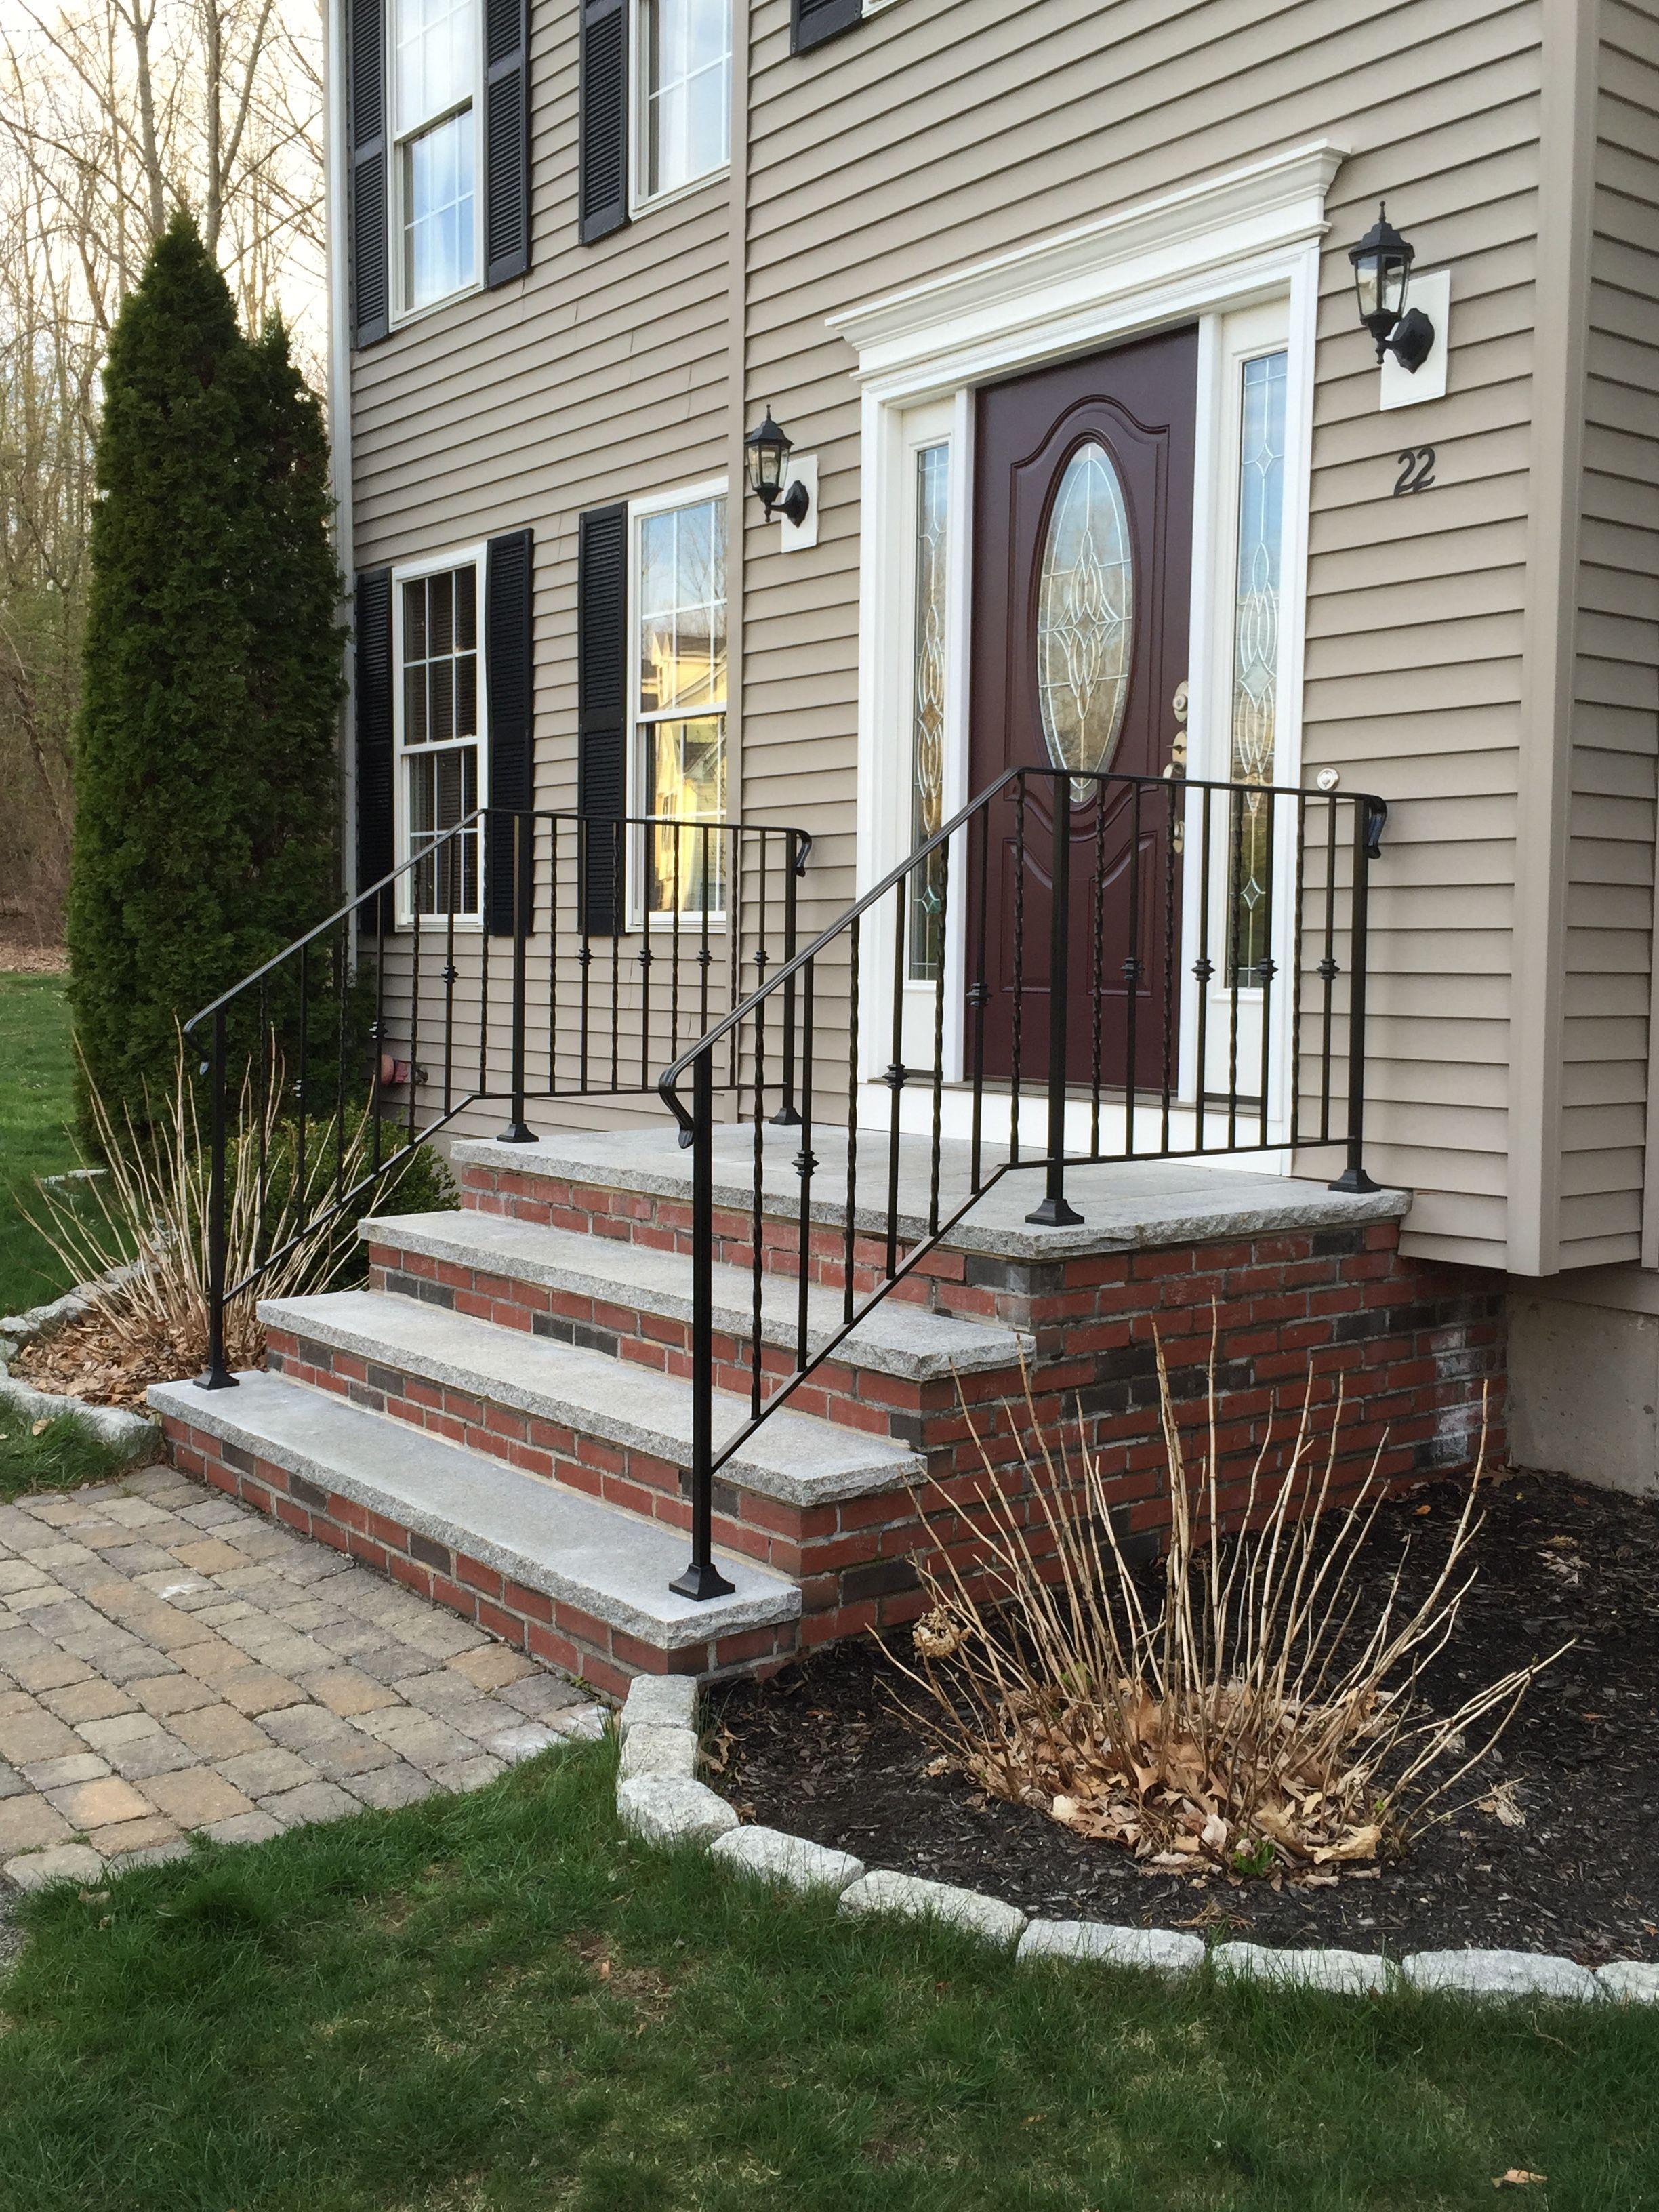 Wrought Iron Railings Granite Steps Cranberry Door With Sidelights Front Door Steps Wrought | Wrought Iron Railings For Outside Steps